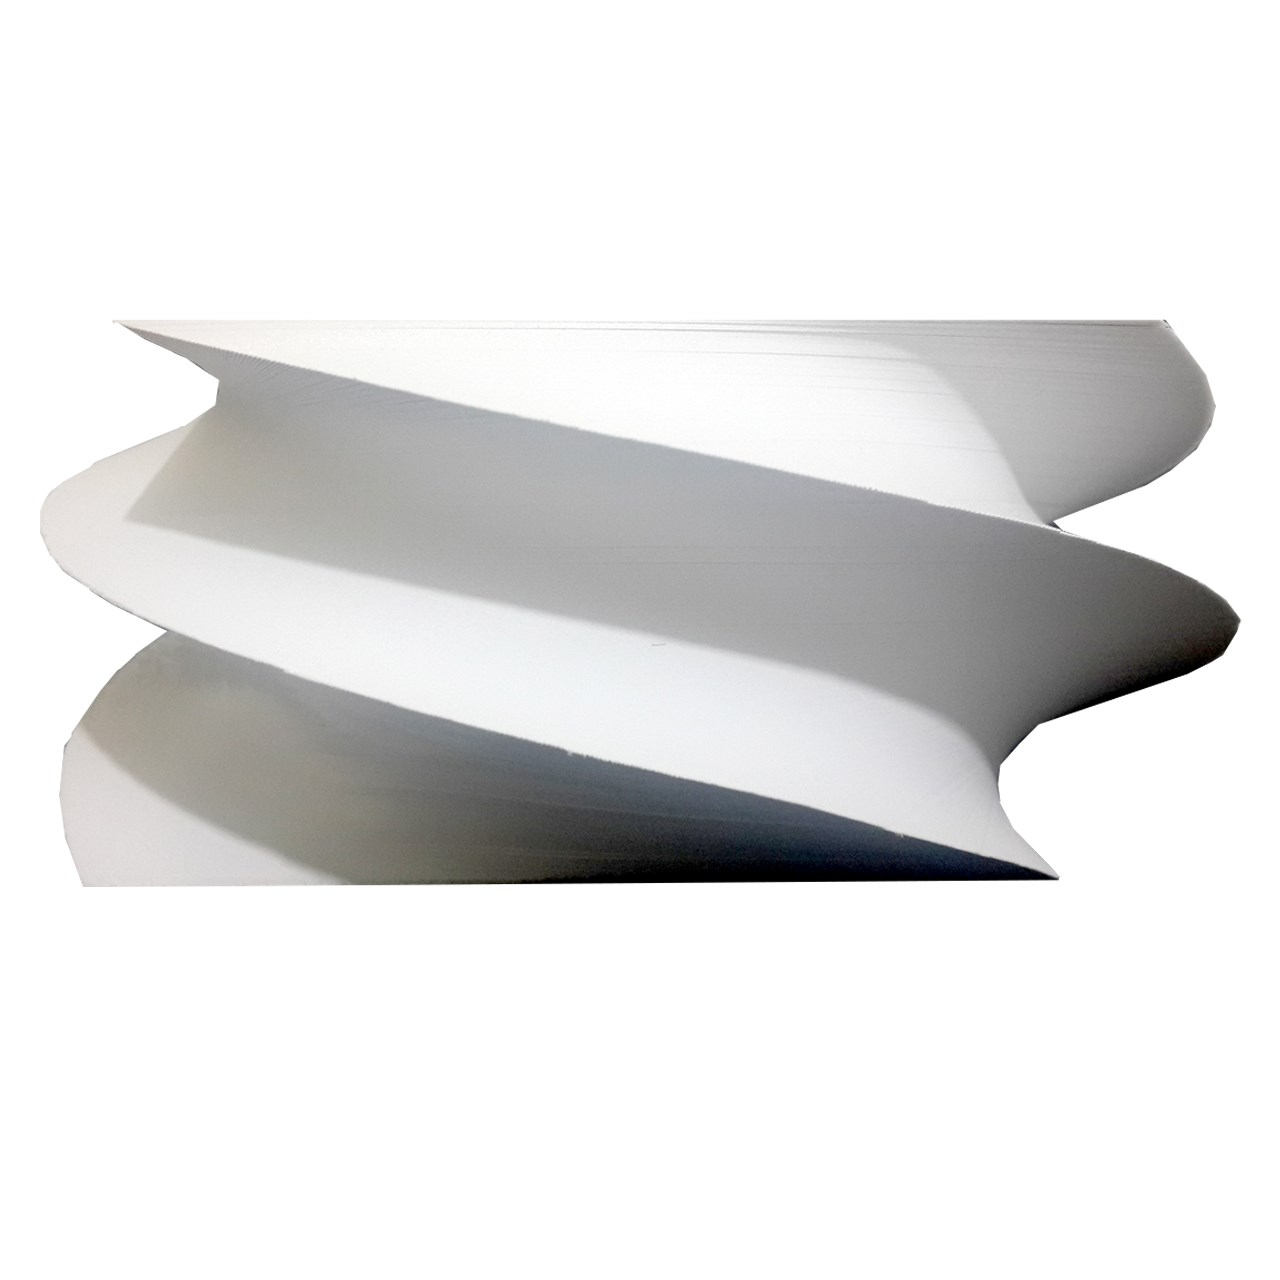 کاغذ یادداشت طرح چرخشی